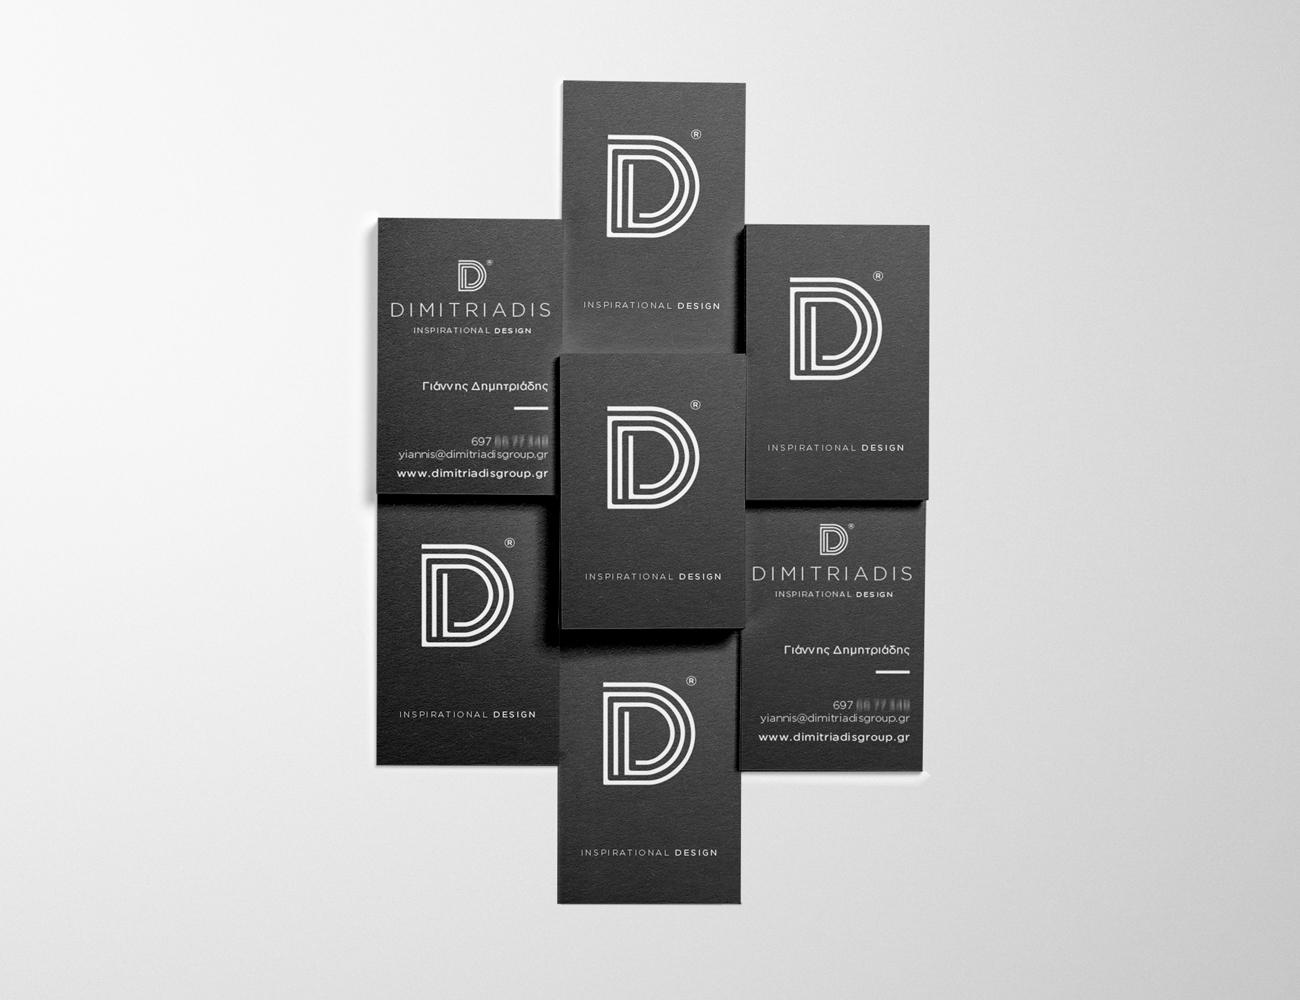 dimitriadisbrandidentity3